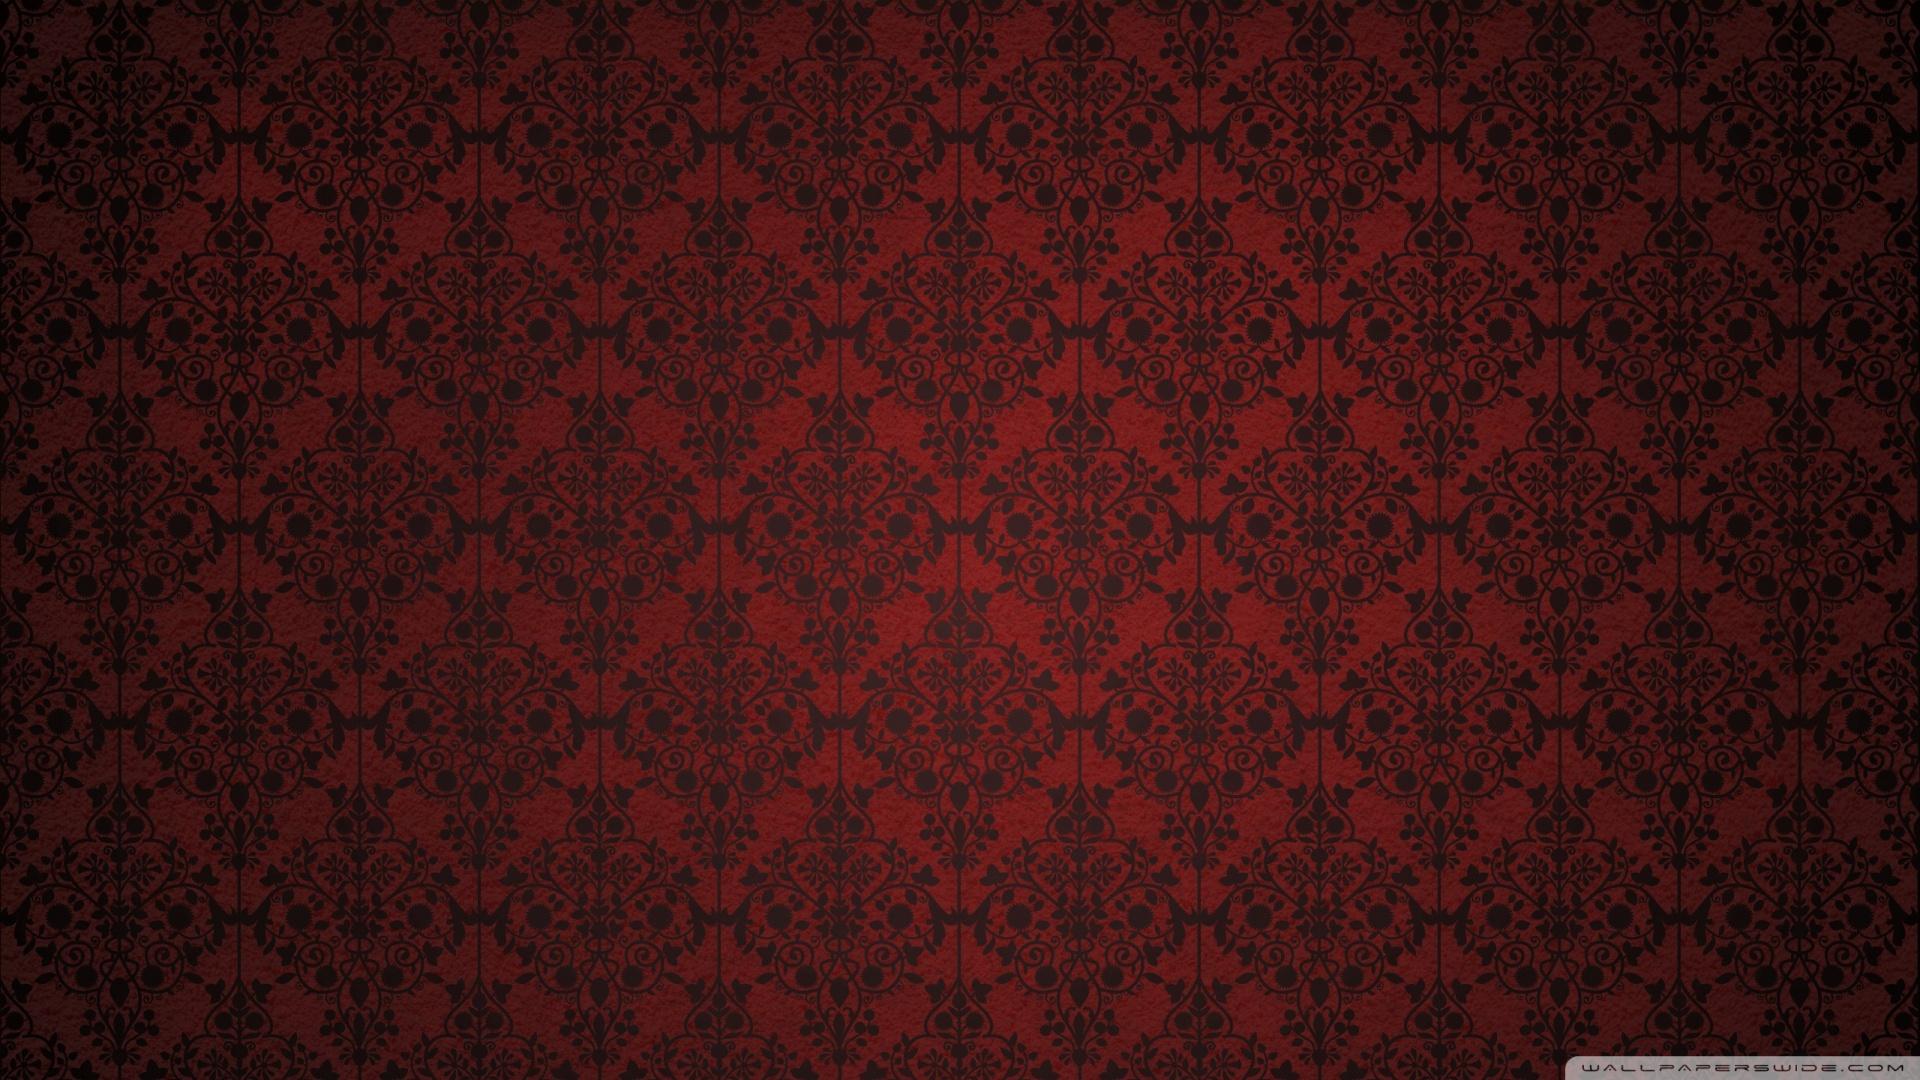 Red Damask Wallpaper 1920x1080